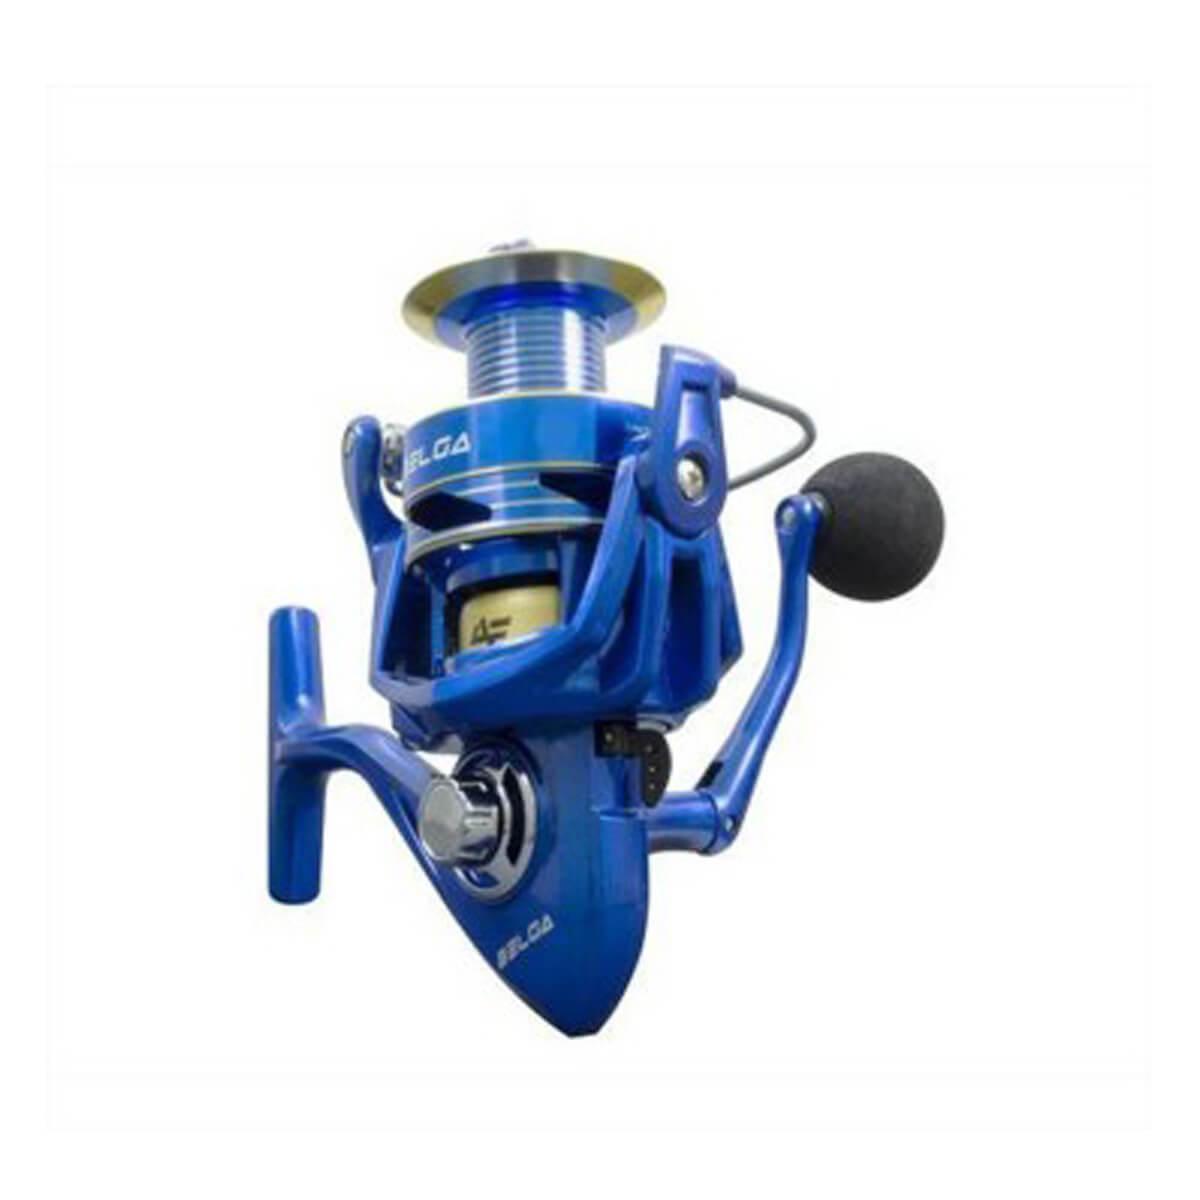 Molinete Belga 40 (Royal Blue)  - Pró Pesca Shop